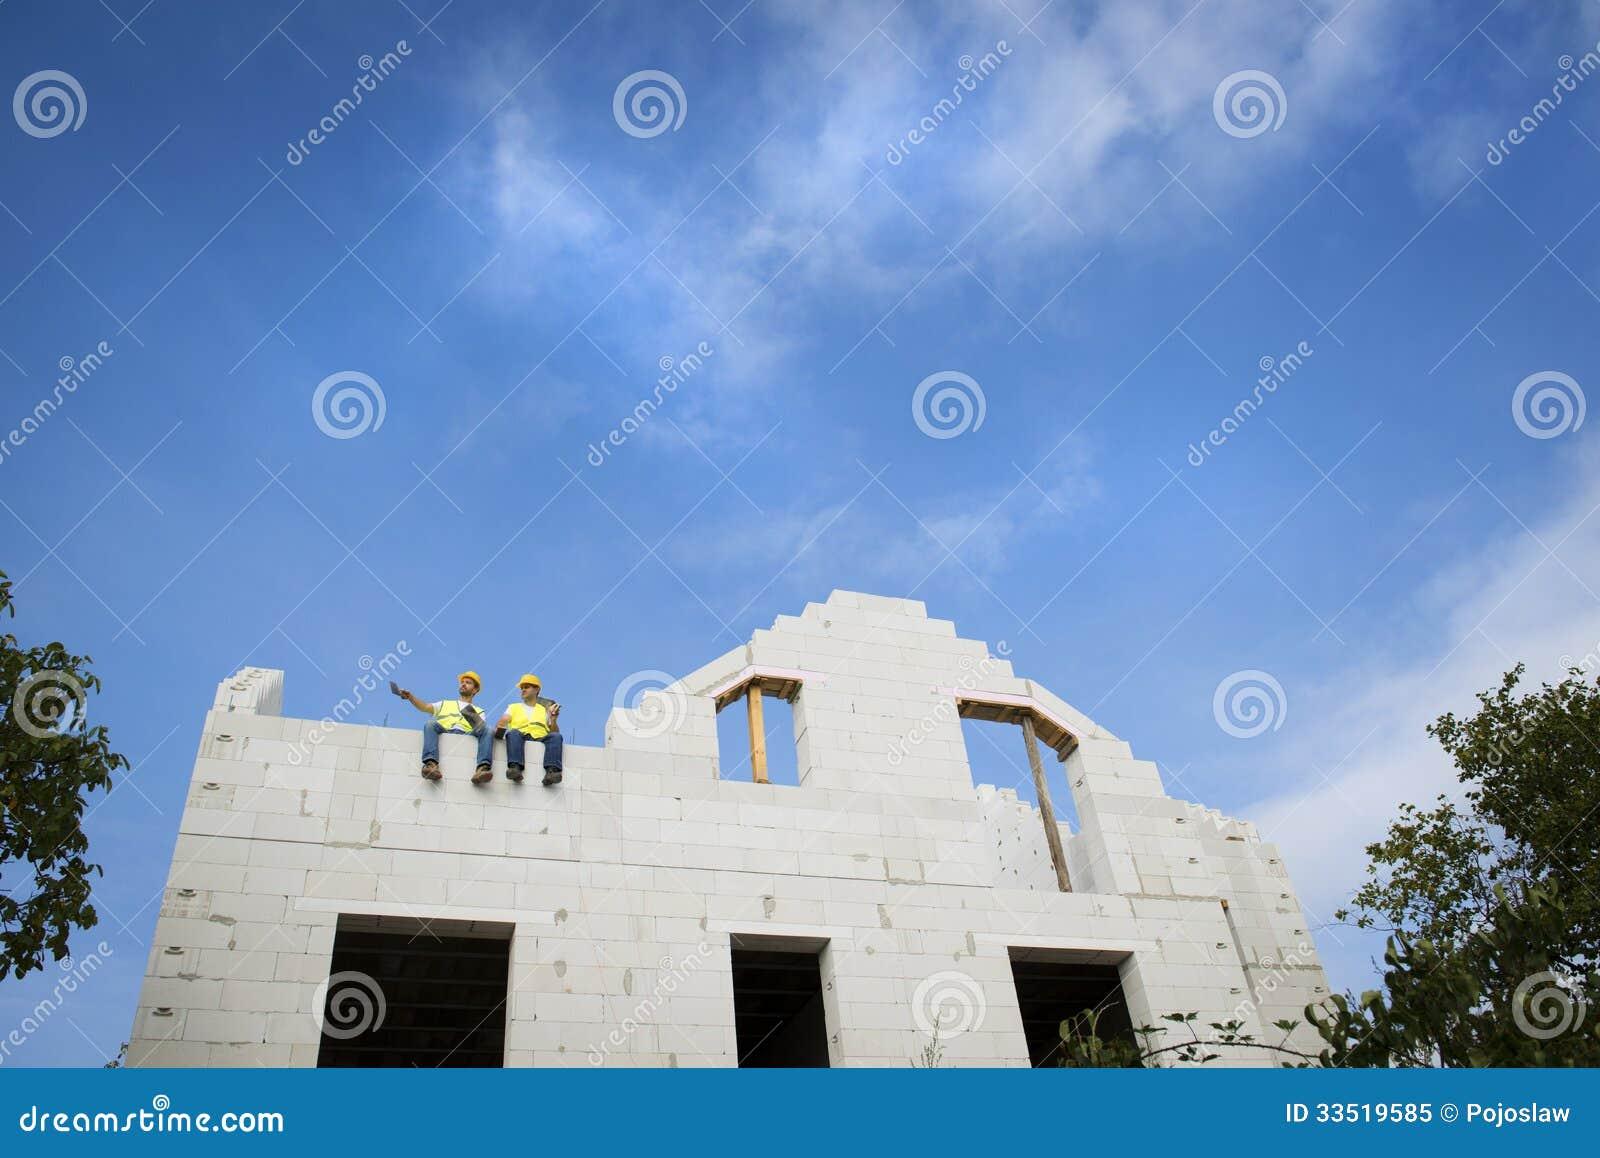 House Construction Royalty Free Stock Photo Image 33519585